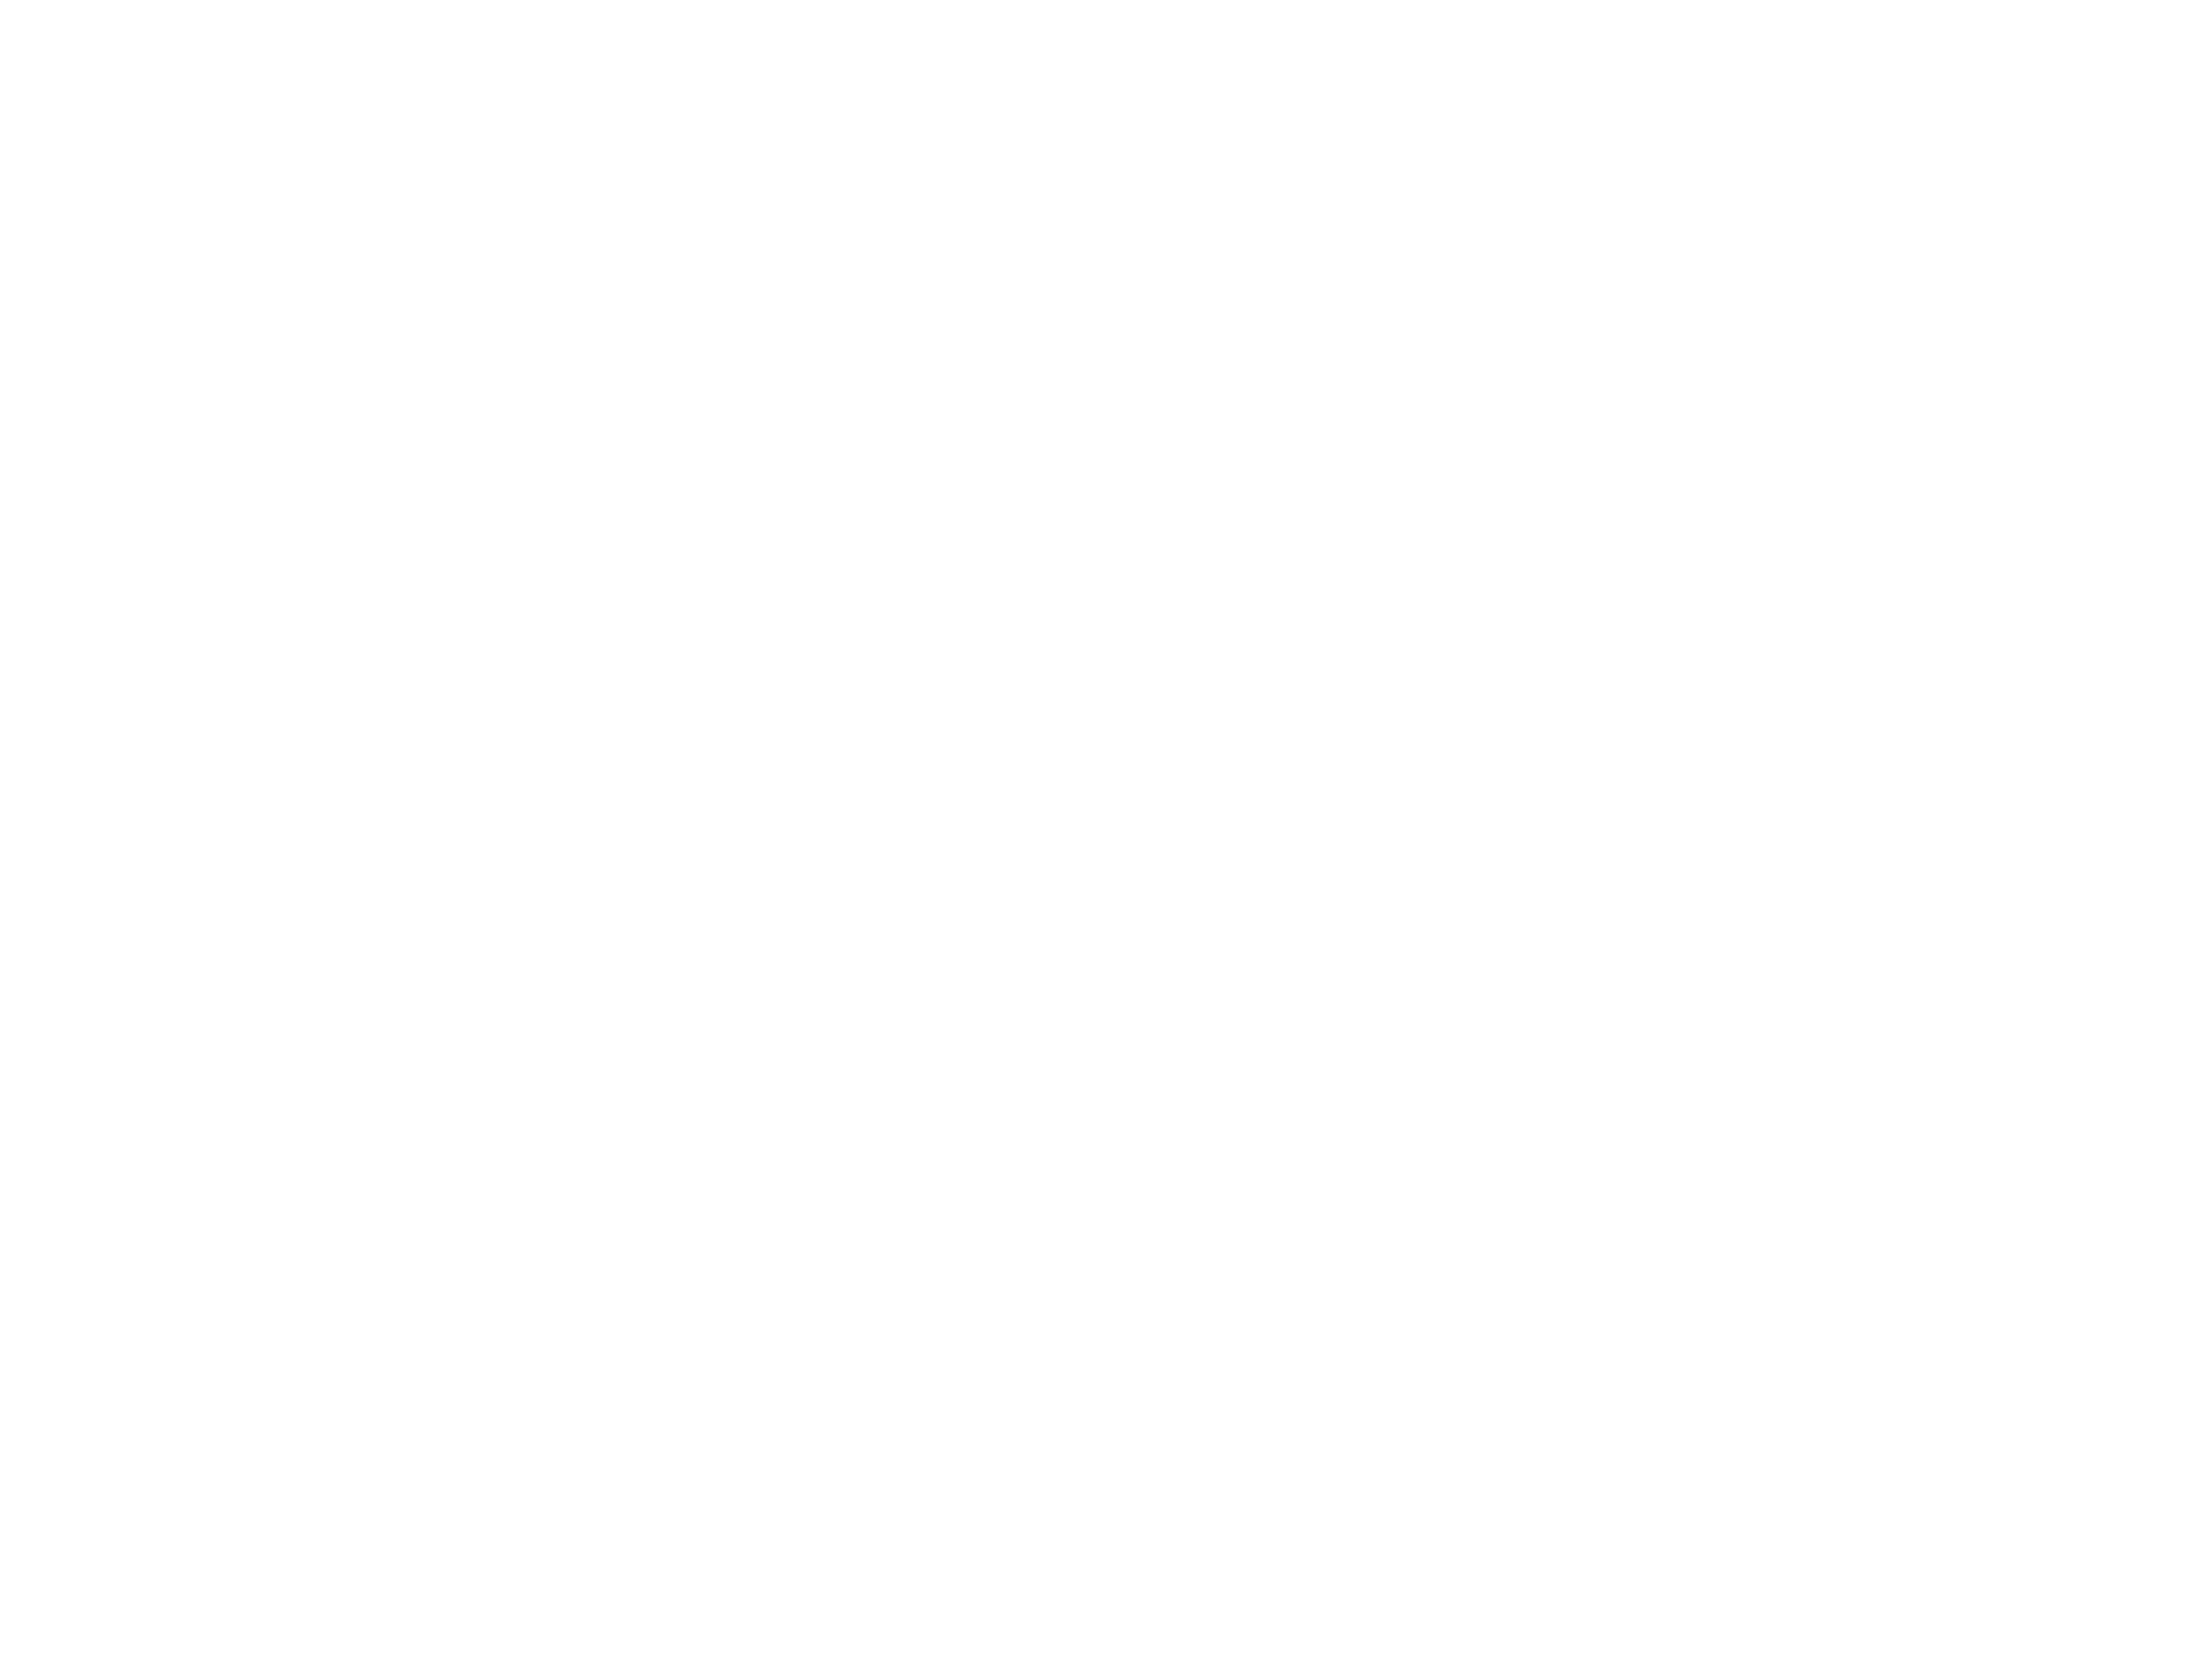 People's Response Act